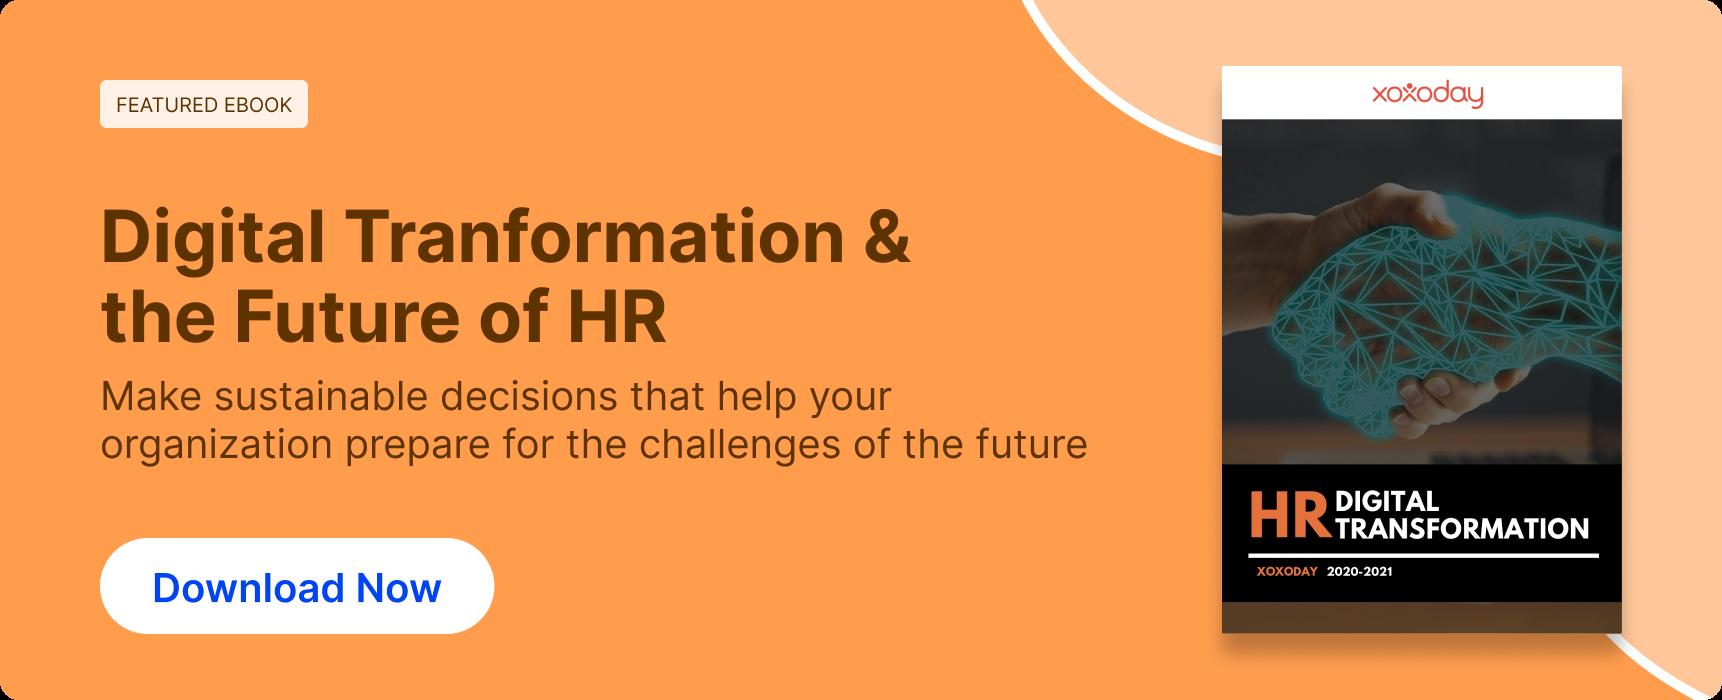 HR Digital Transformation Ebook